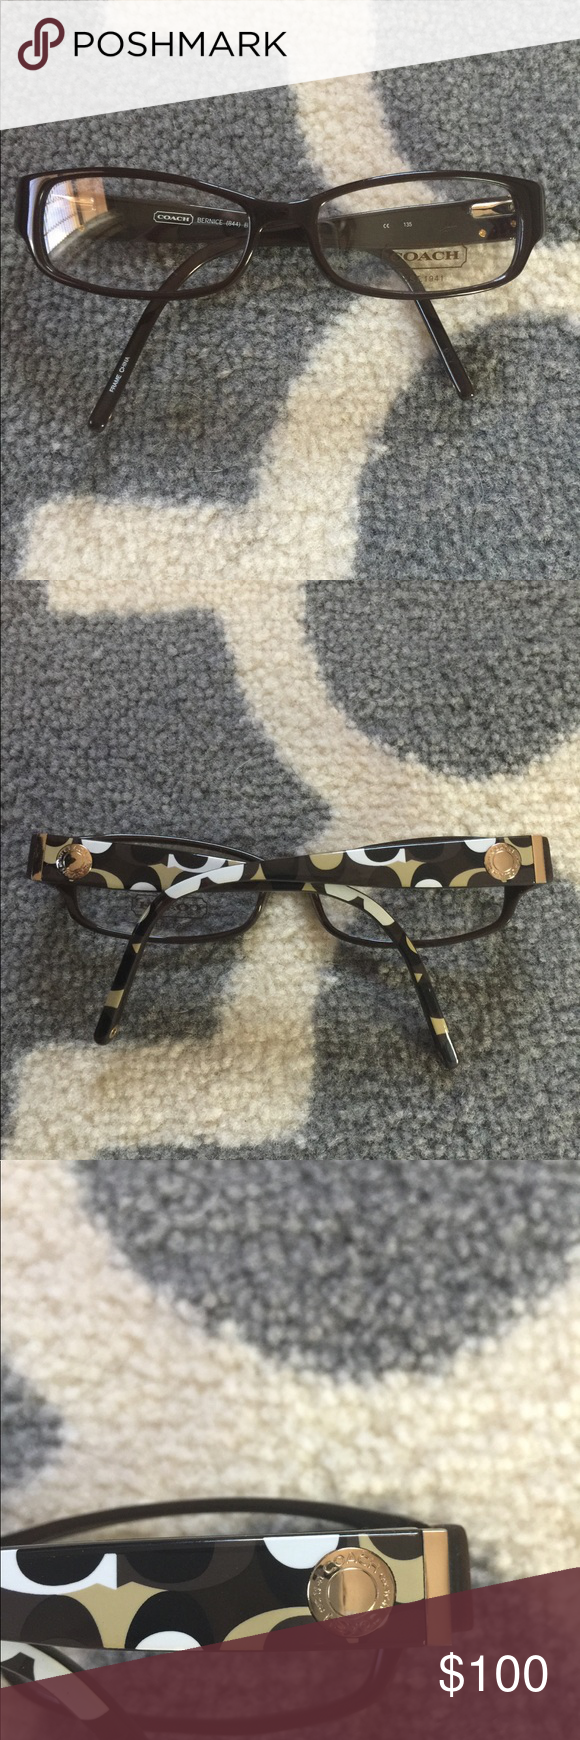 👓 New coach frames *never worn* 👓 OFFERS?!?   Prescription lenses ...